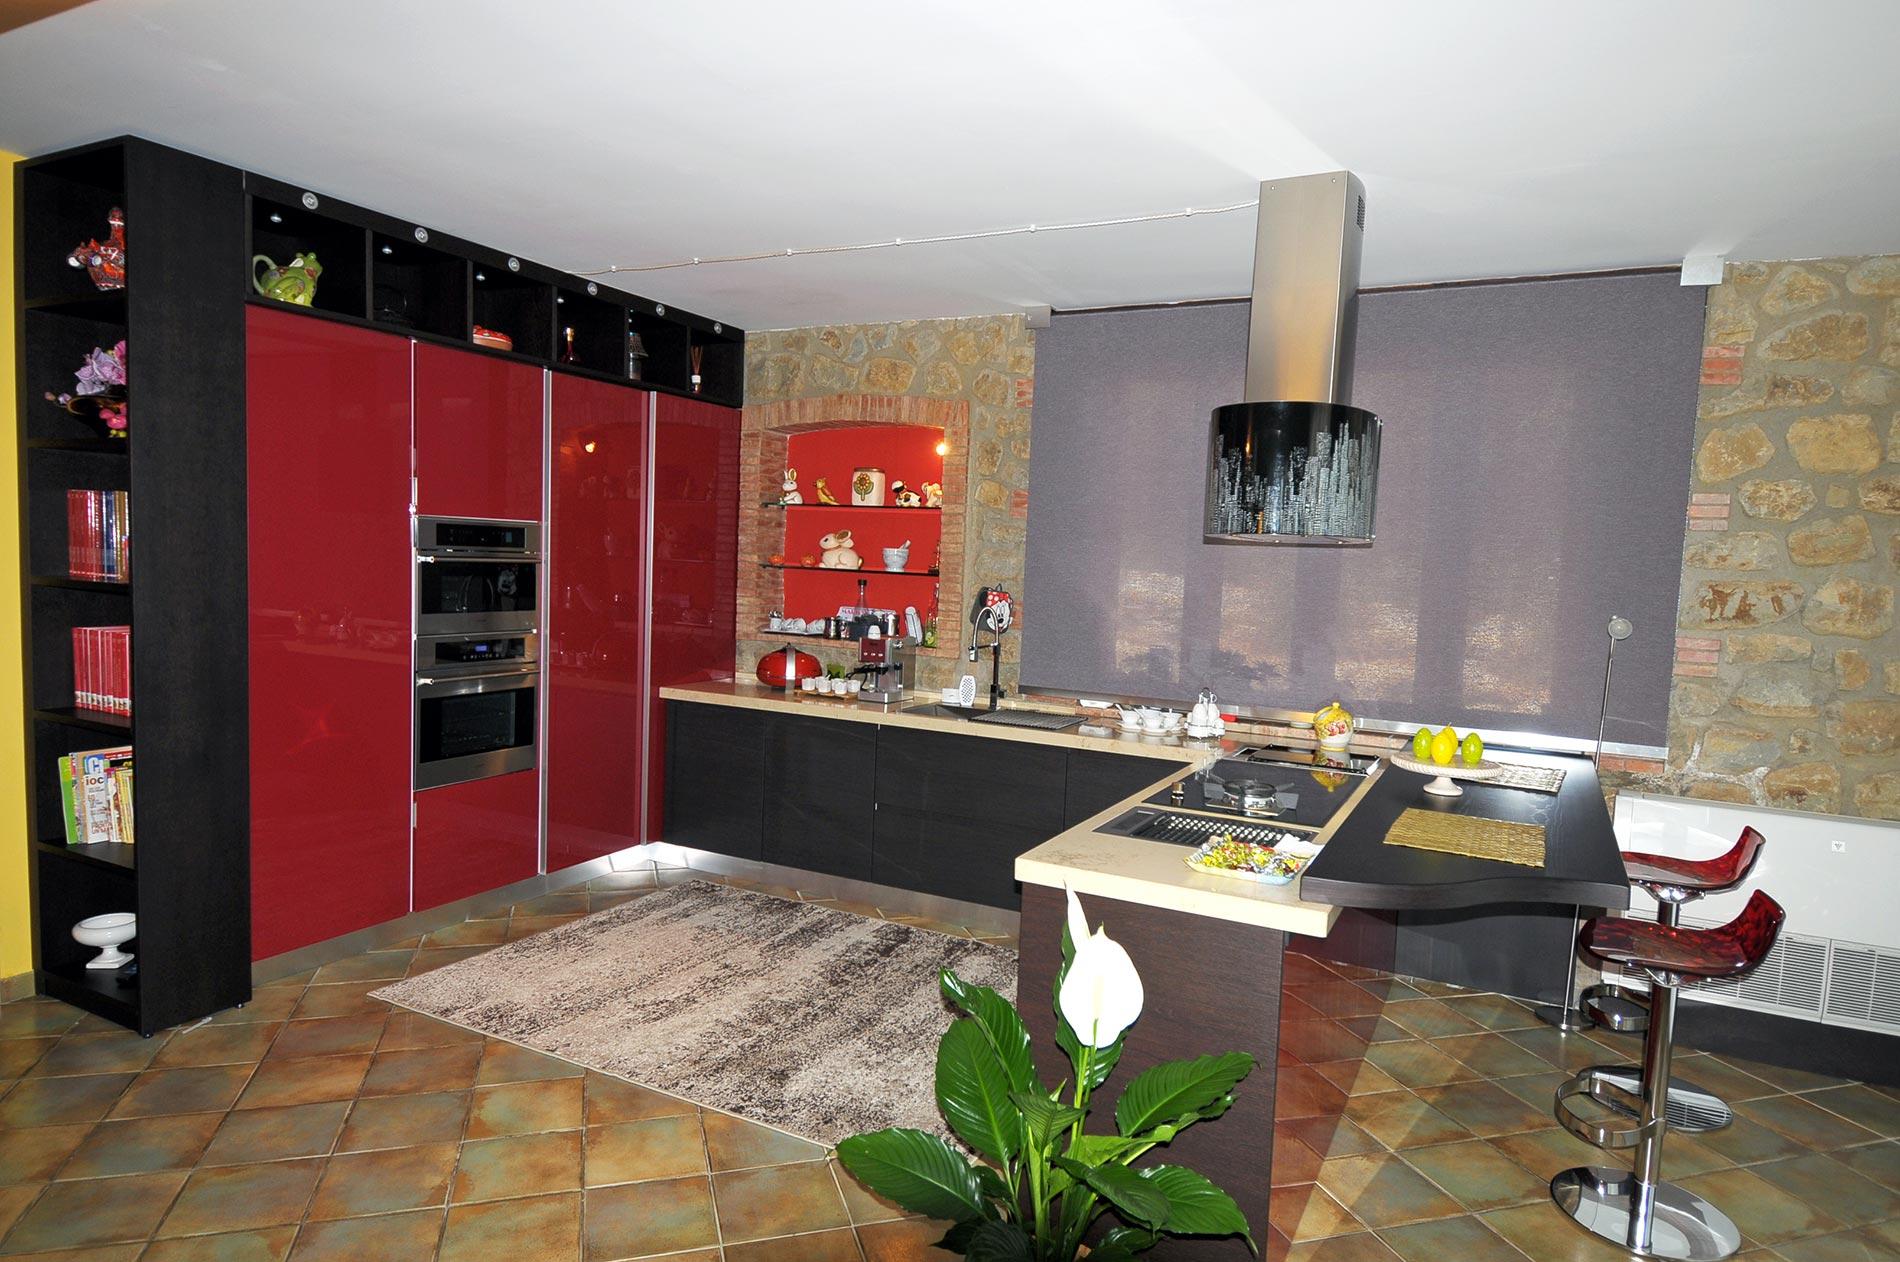 Cucina multifunzionale moderna dai colori rosso, wenghè e beije - Senso